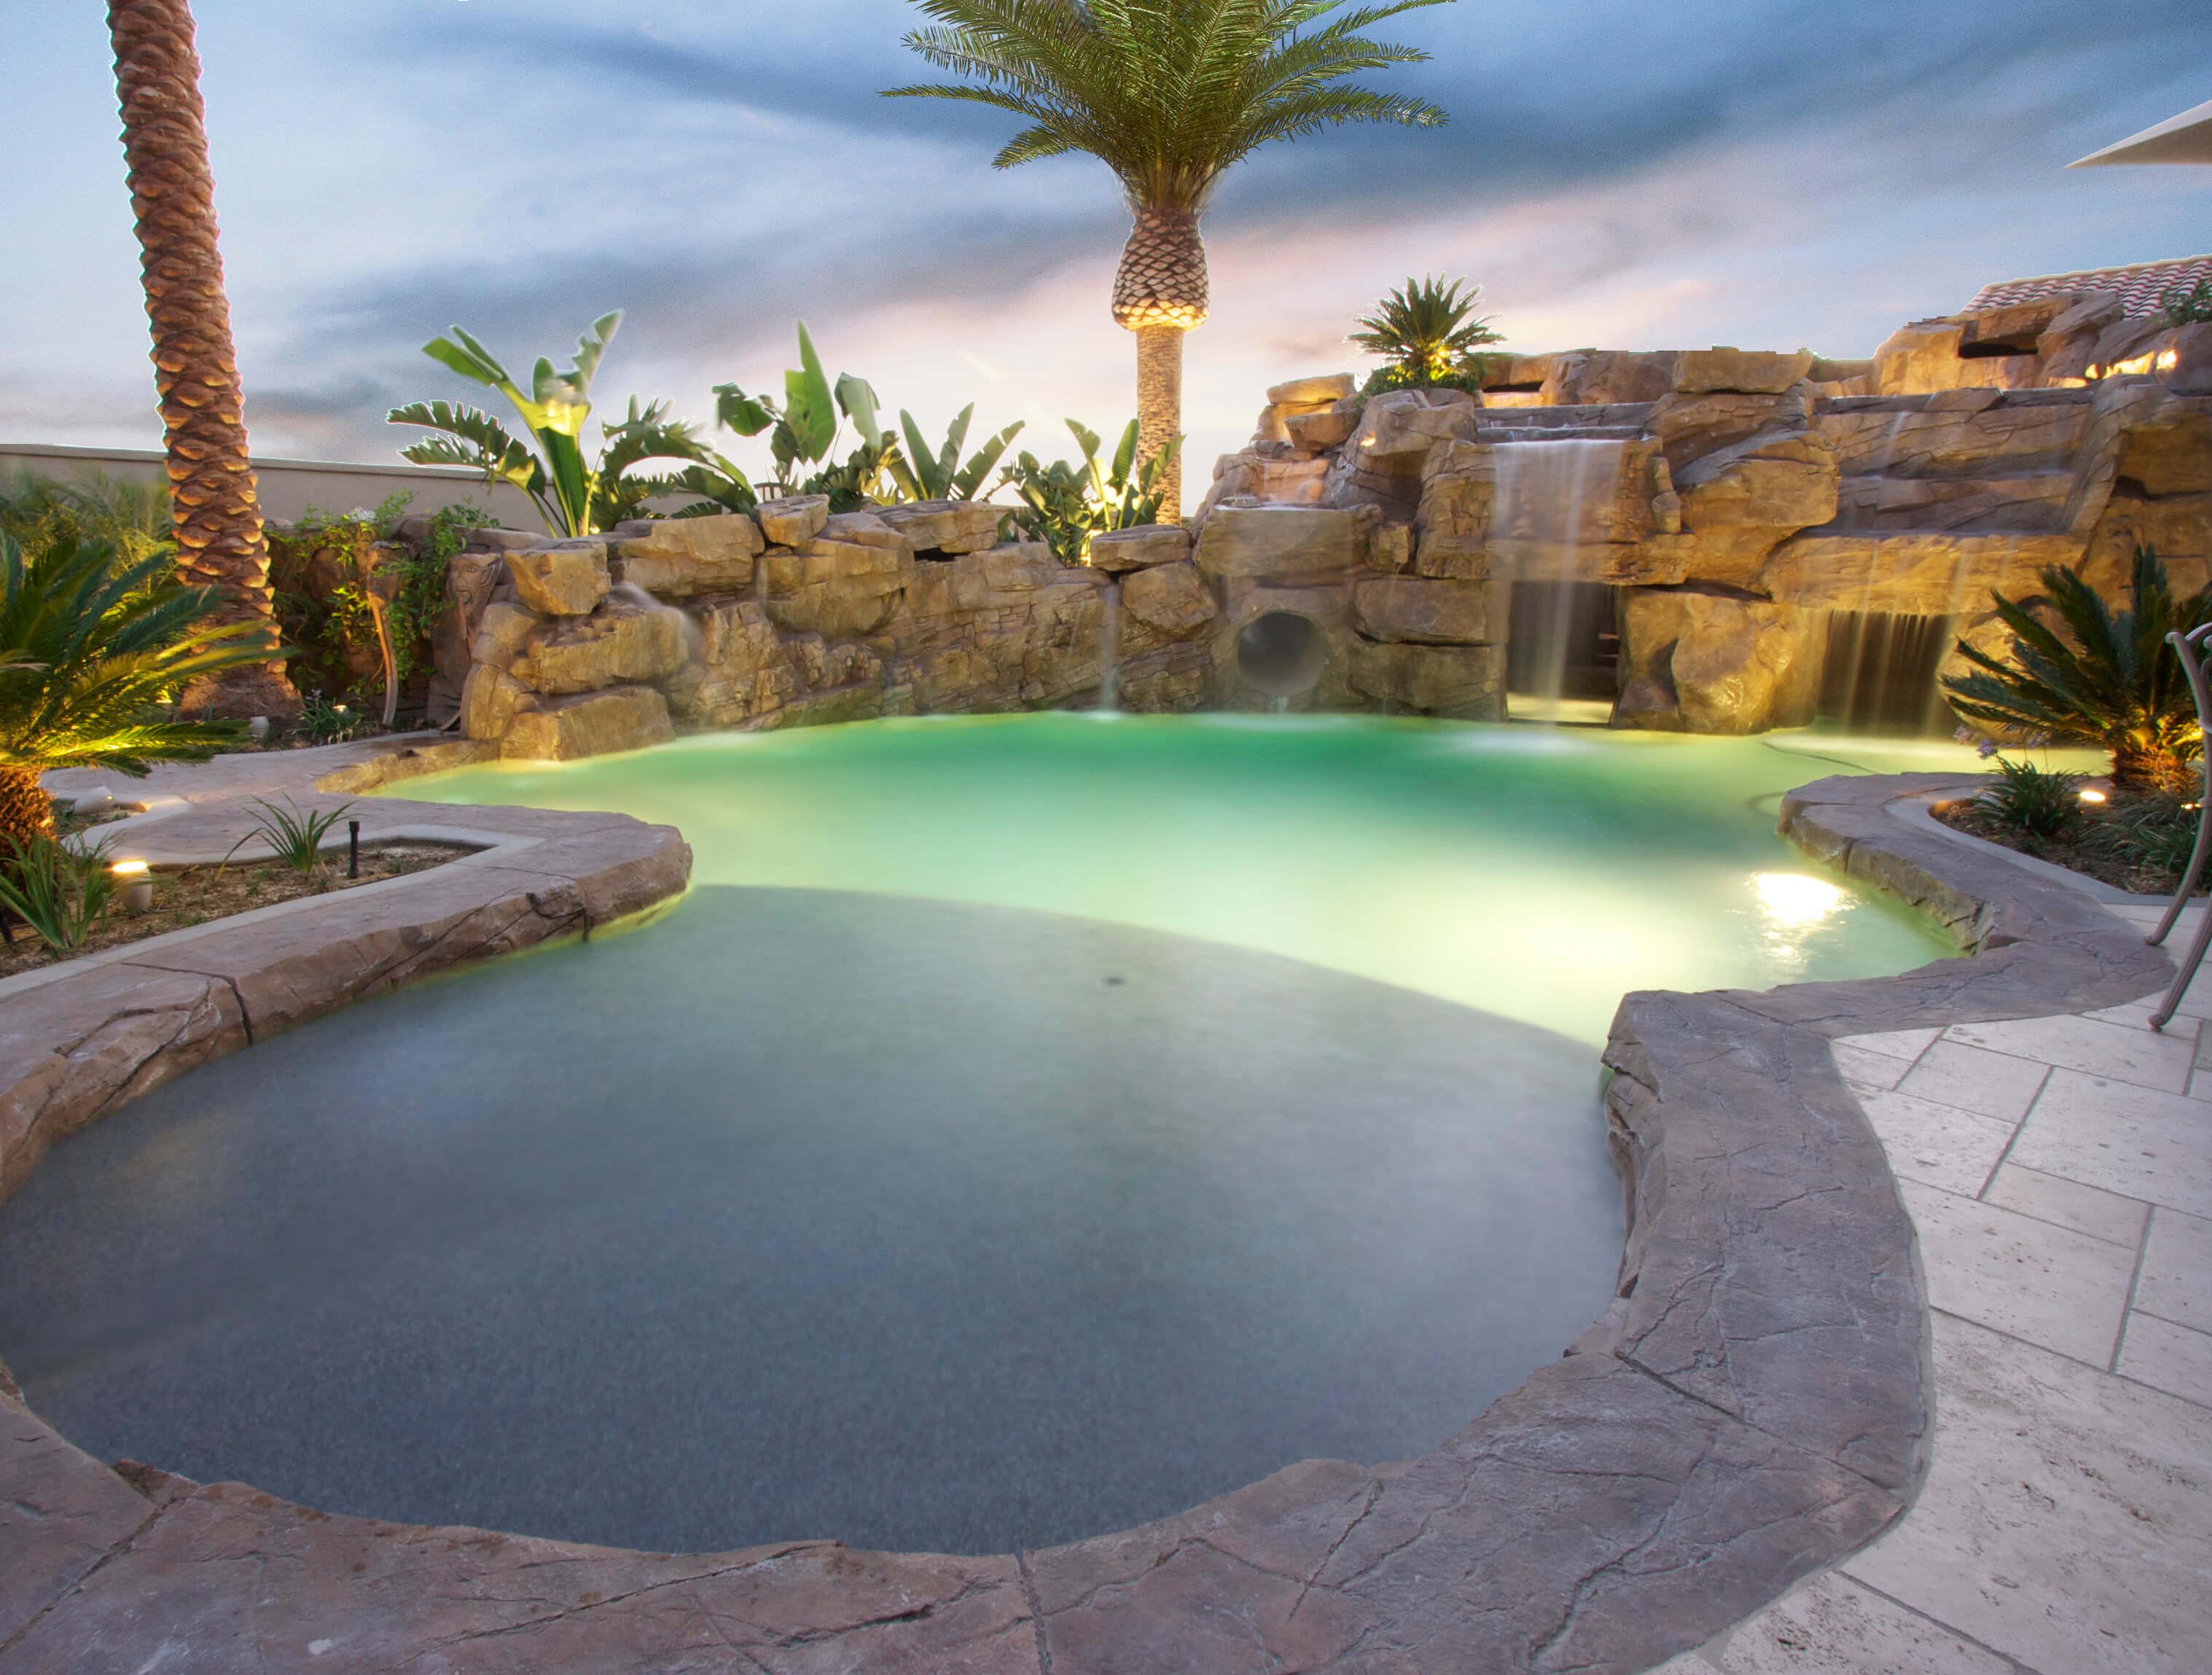 Small Backyard Pools With Waterfall